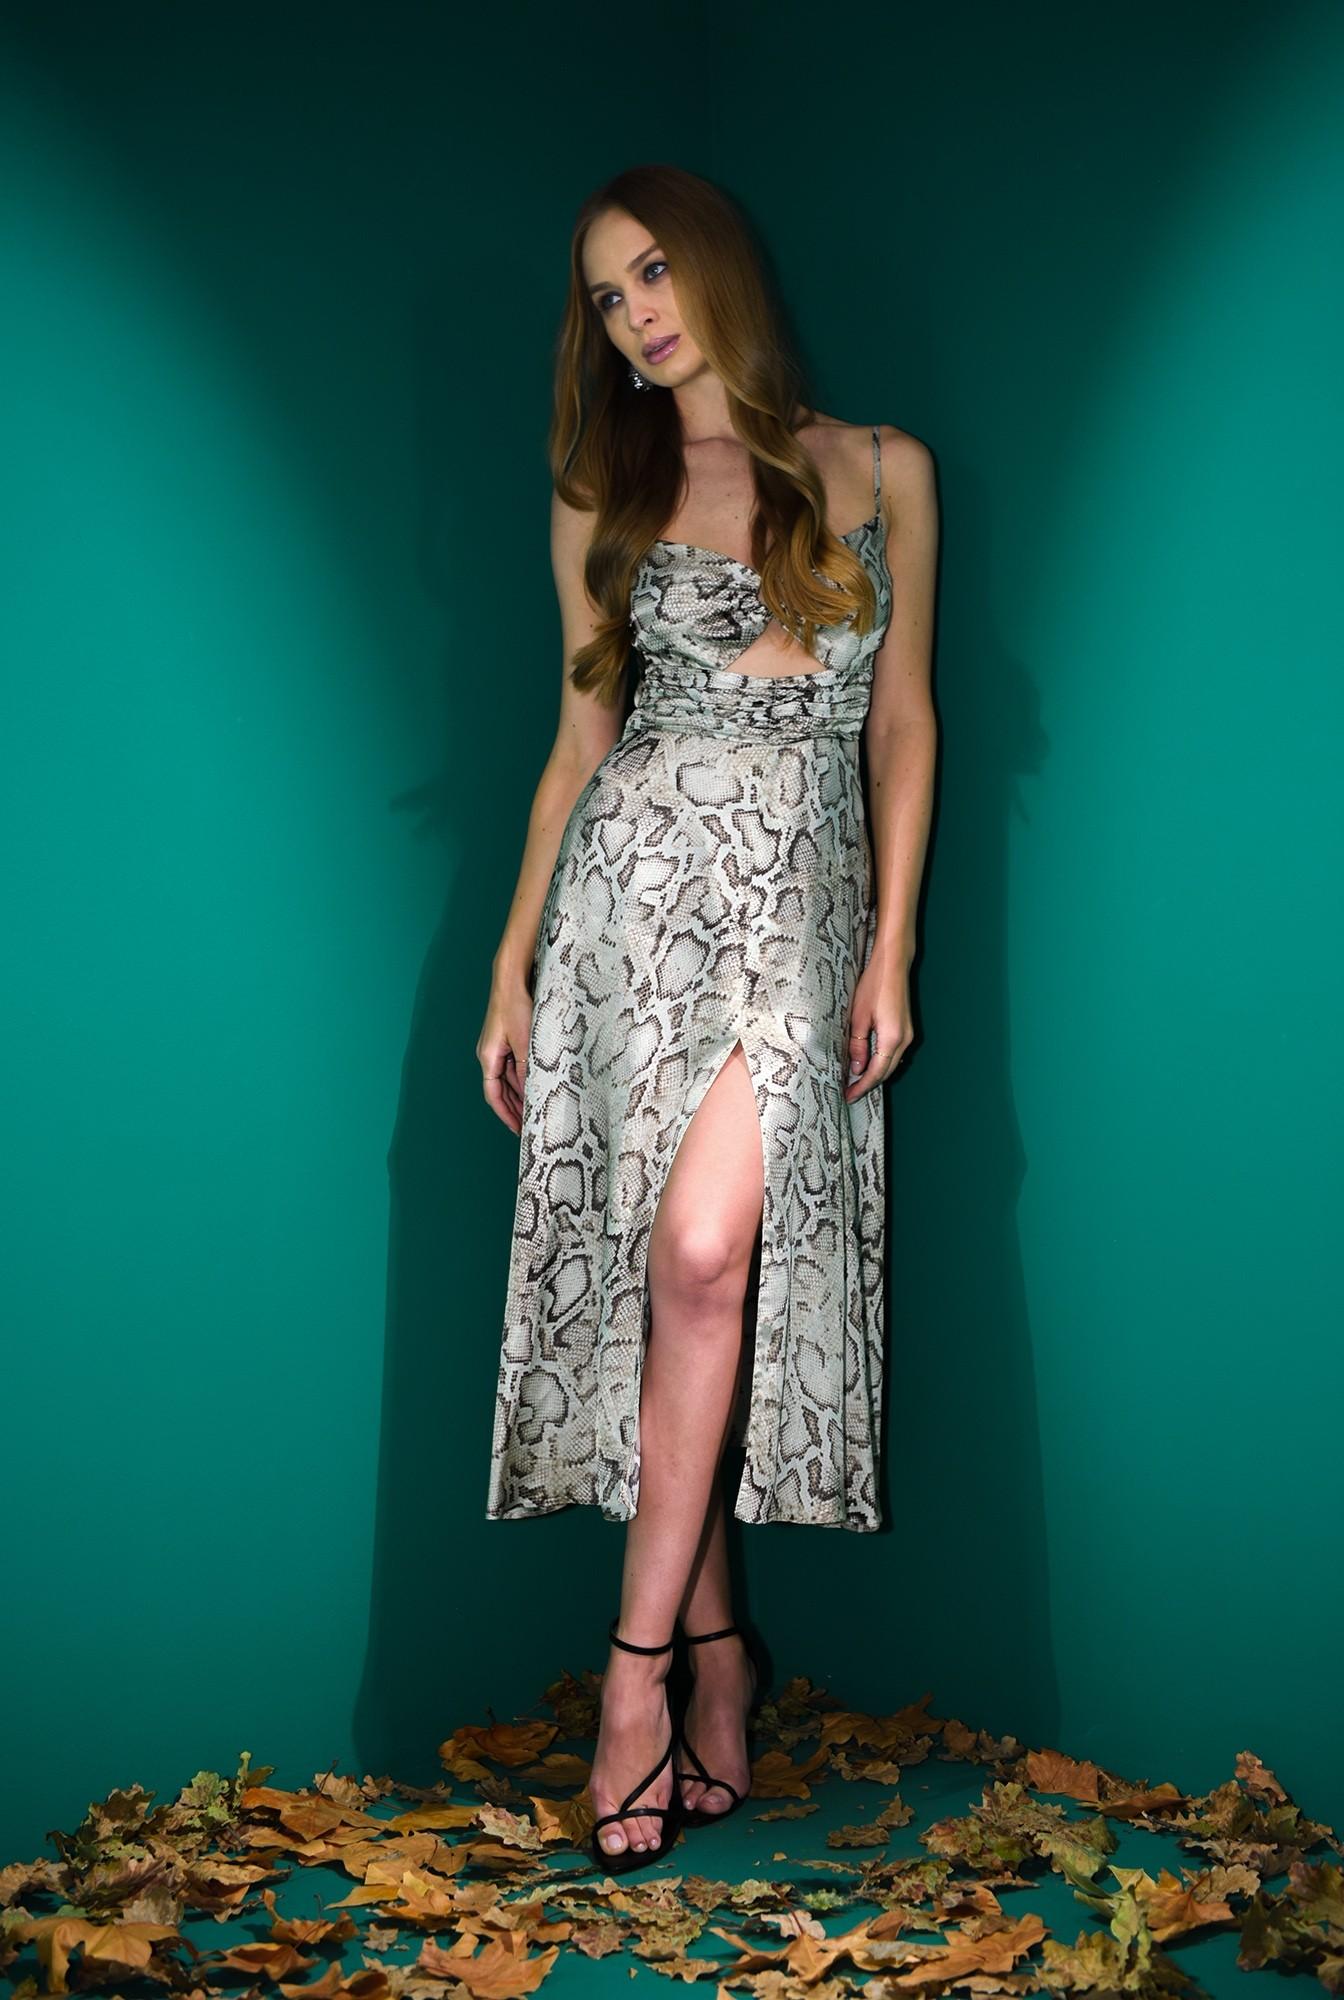 0 - rochie midi, eleganta, animal print, cu decupaj, fronsata pe accesoriu